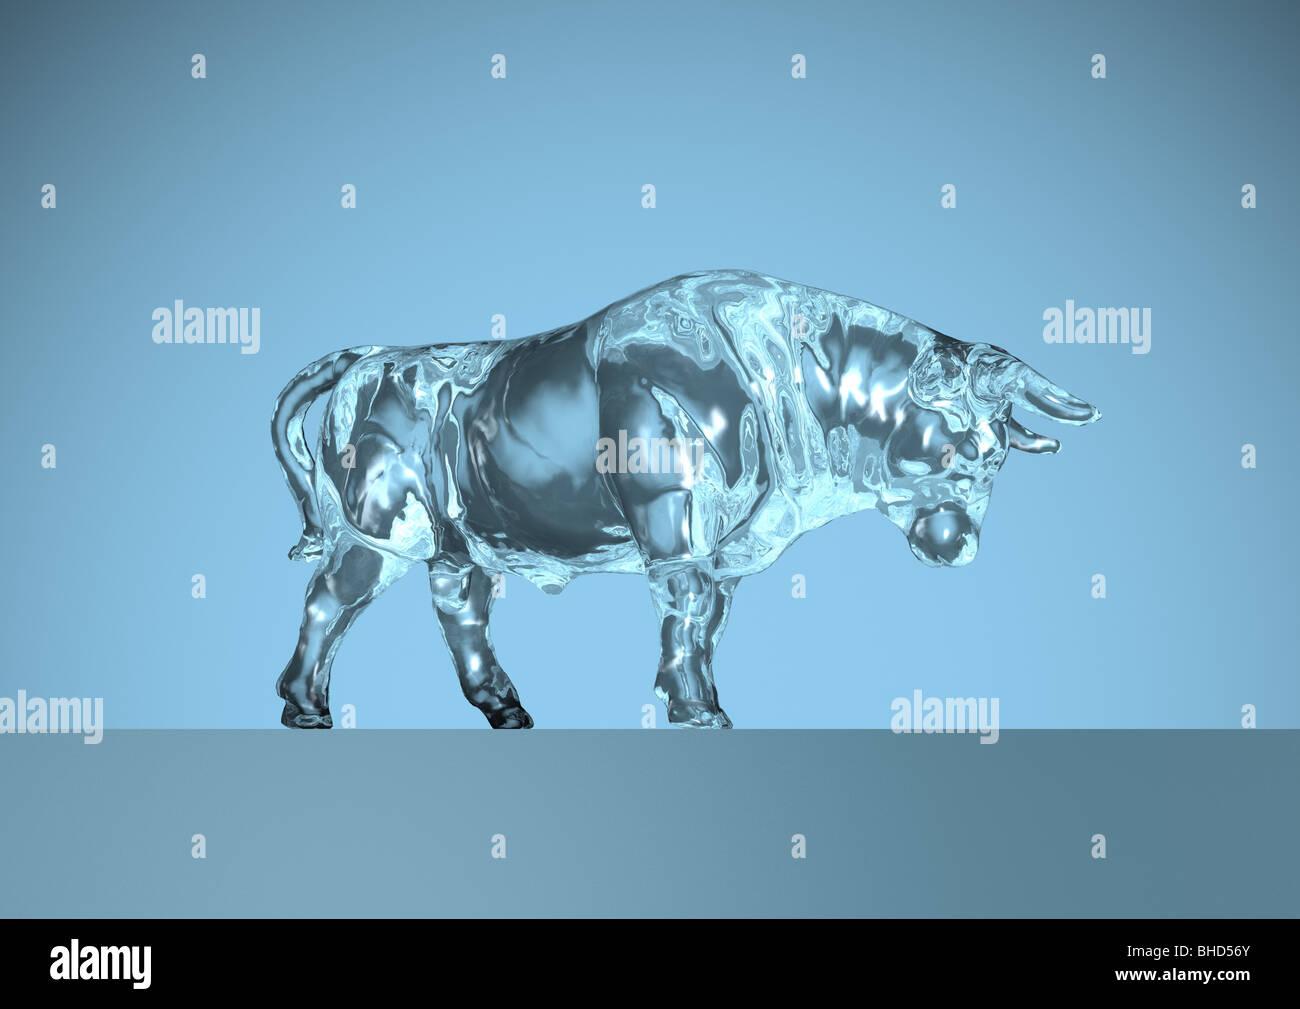 stock exchange, bull, bear - Börse, Bulle, Bär - Stock Image